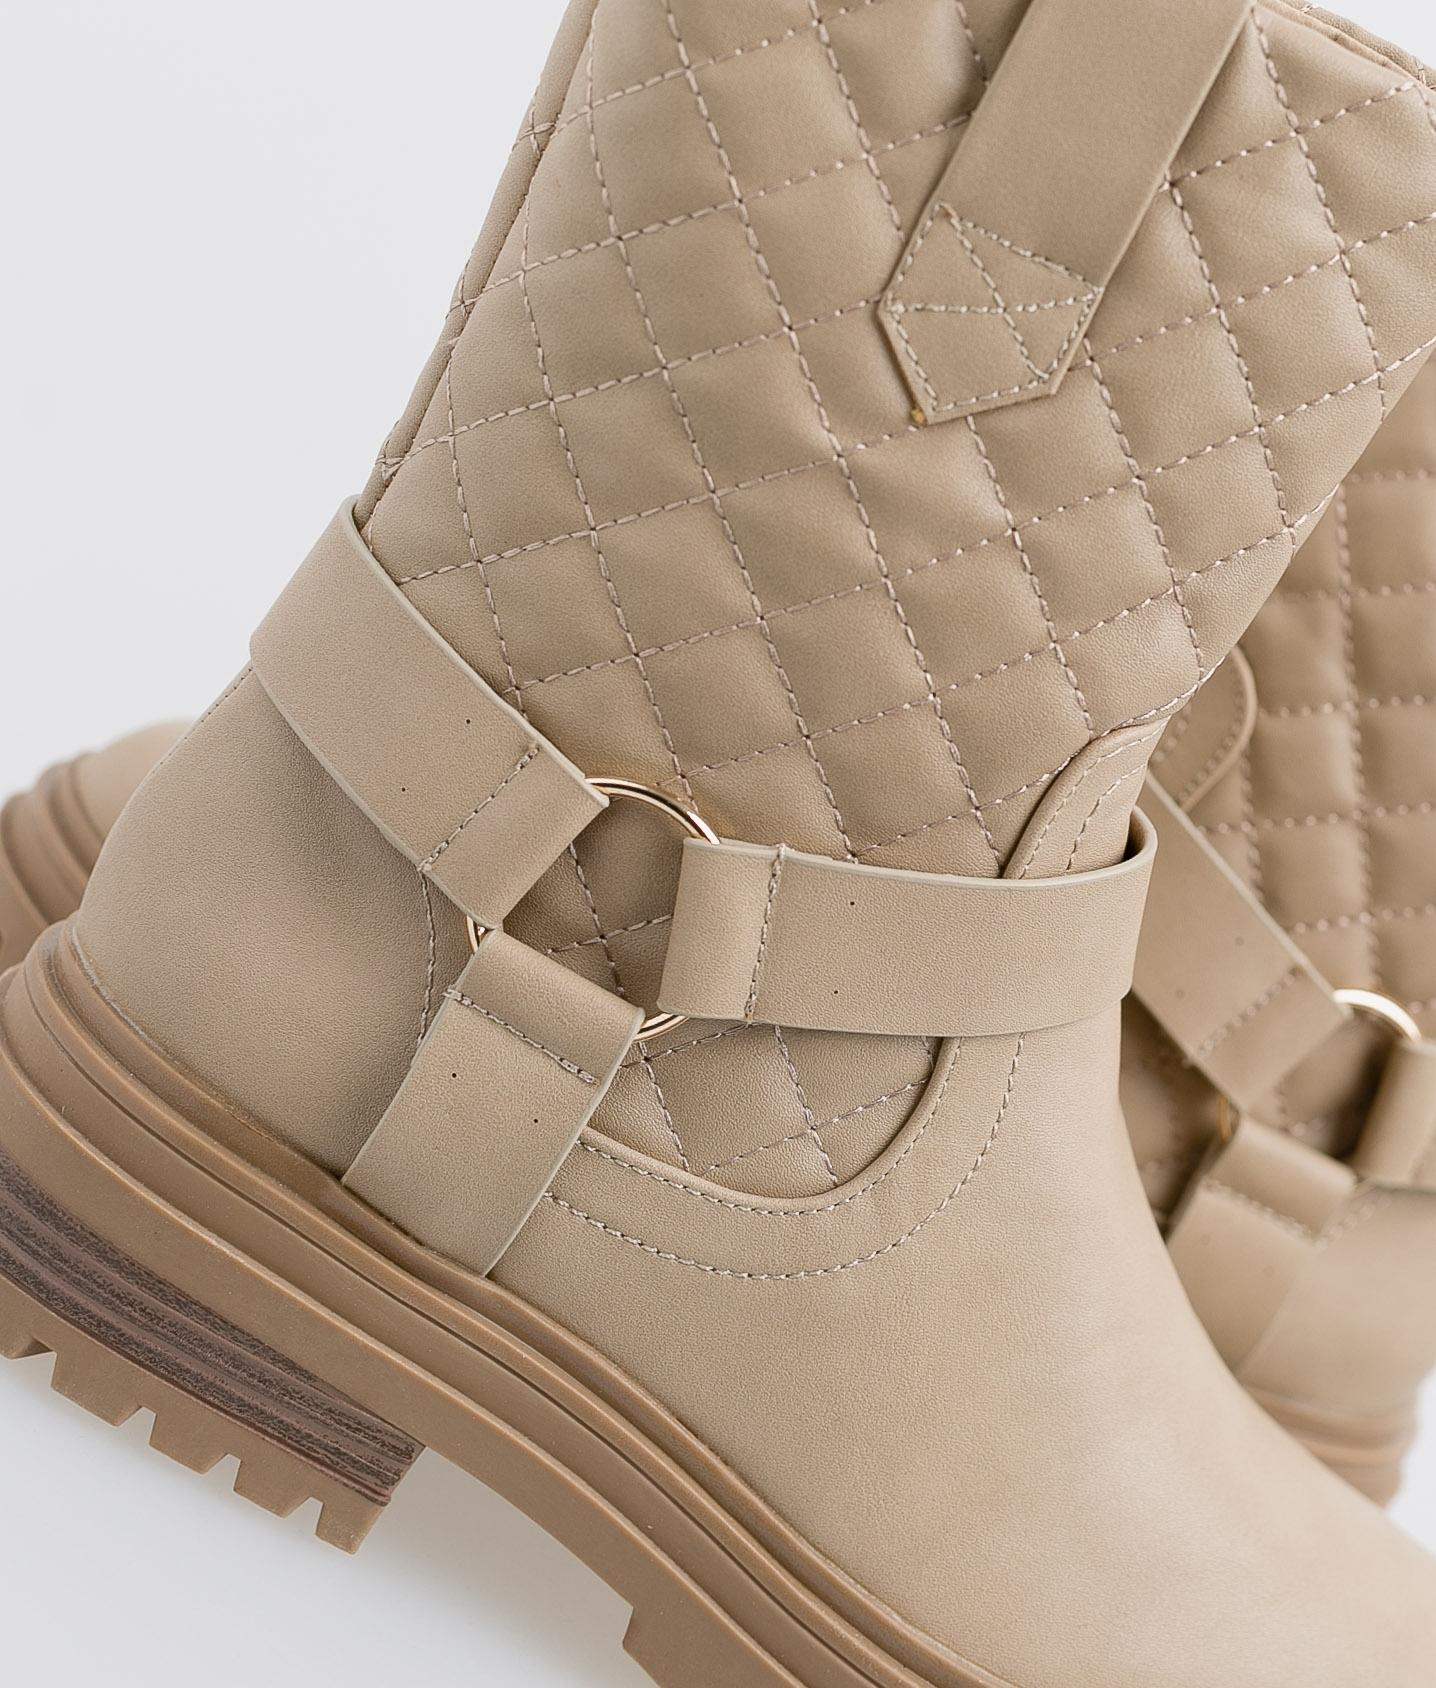 Roslin Low Boot - Beige